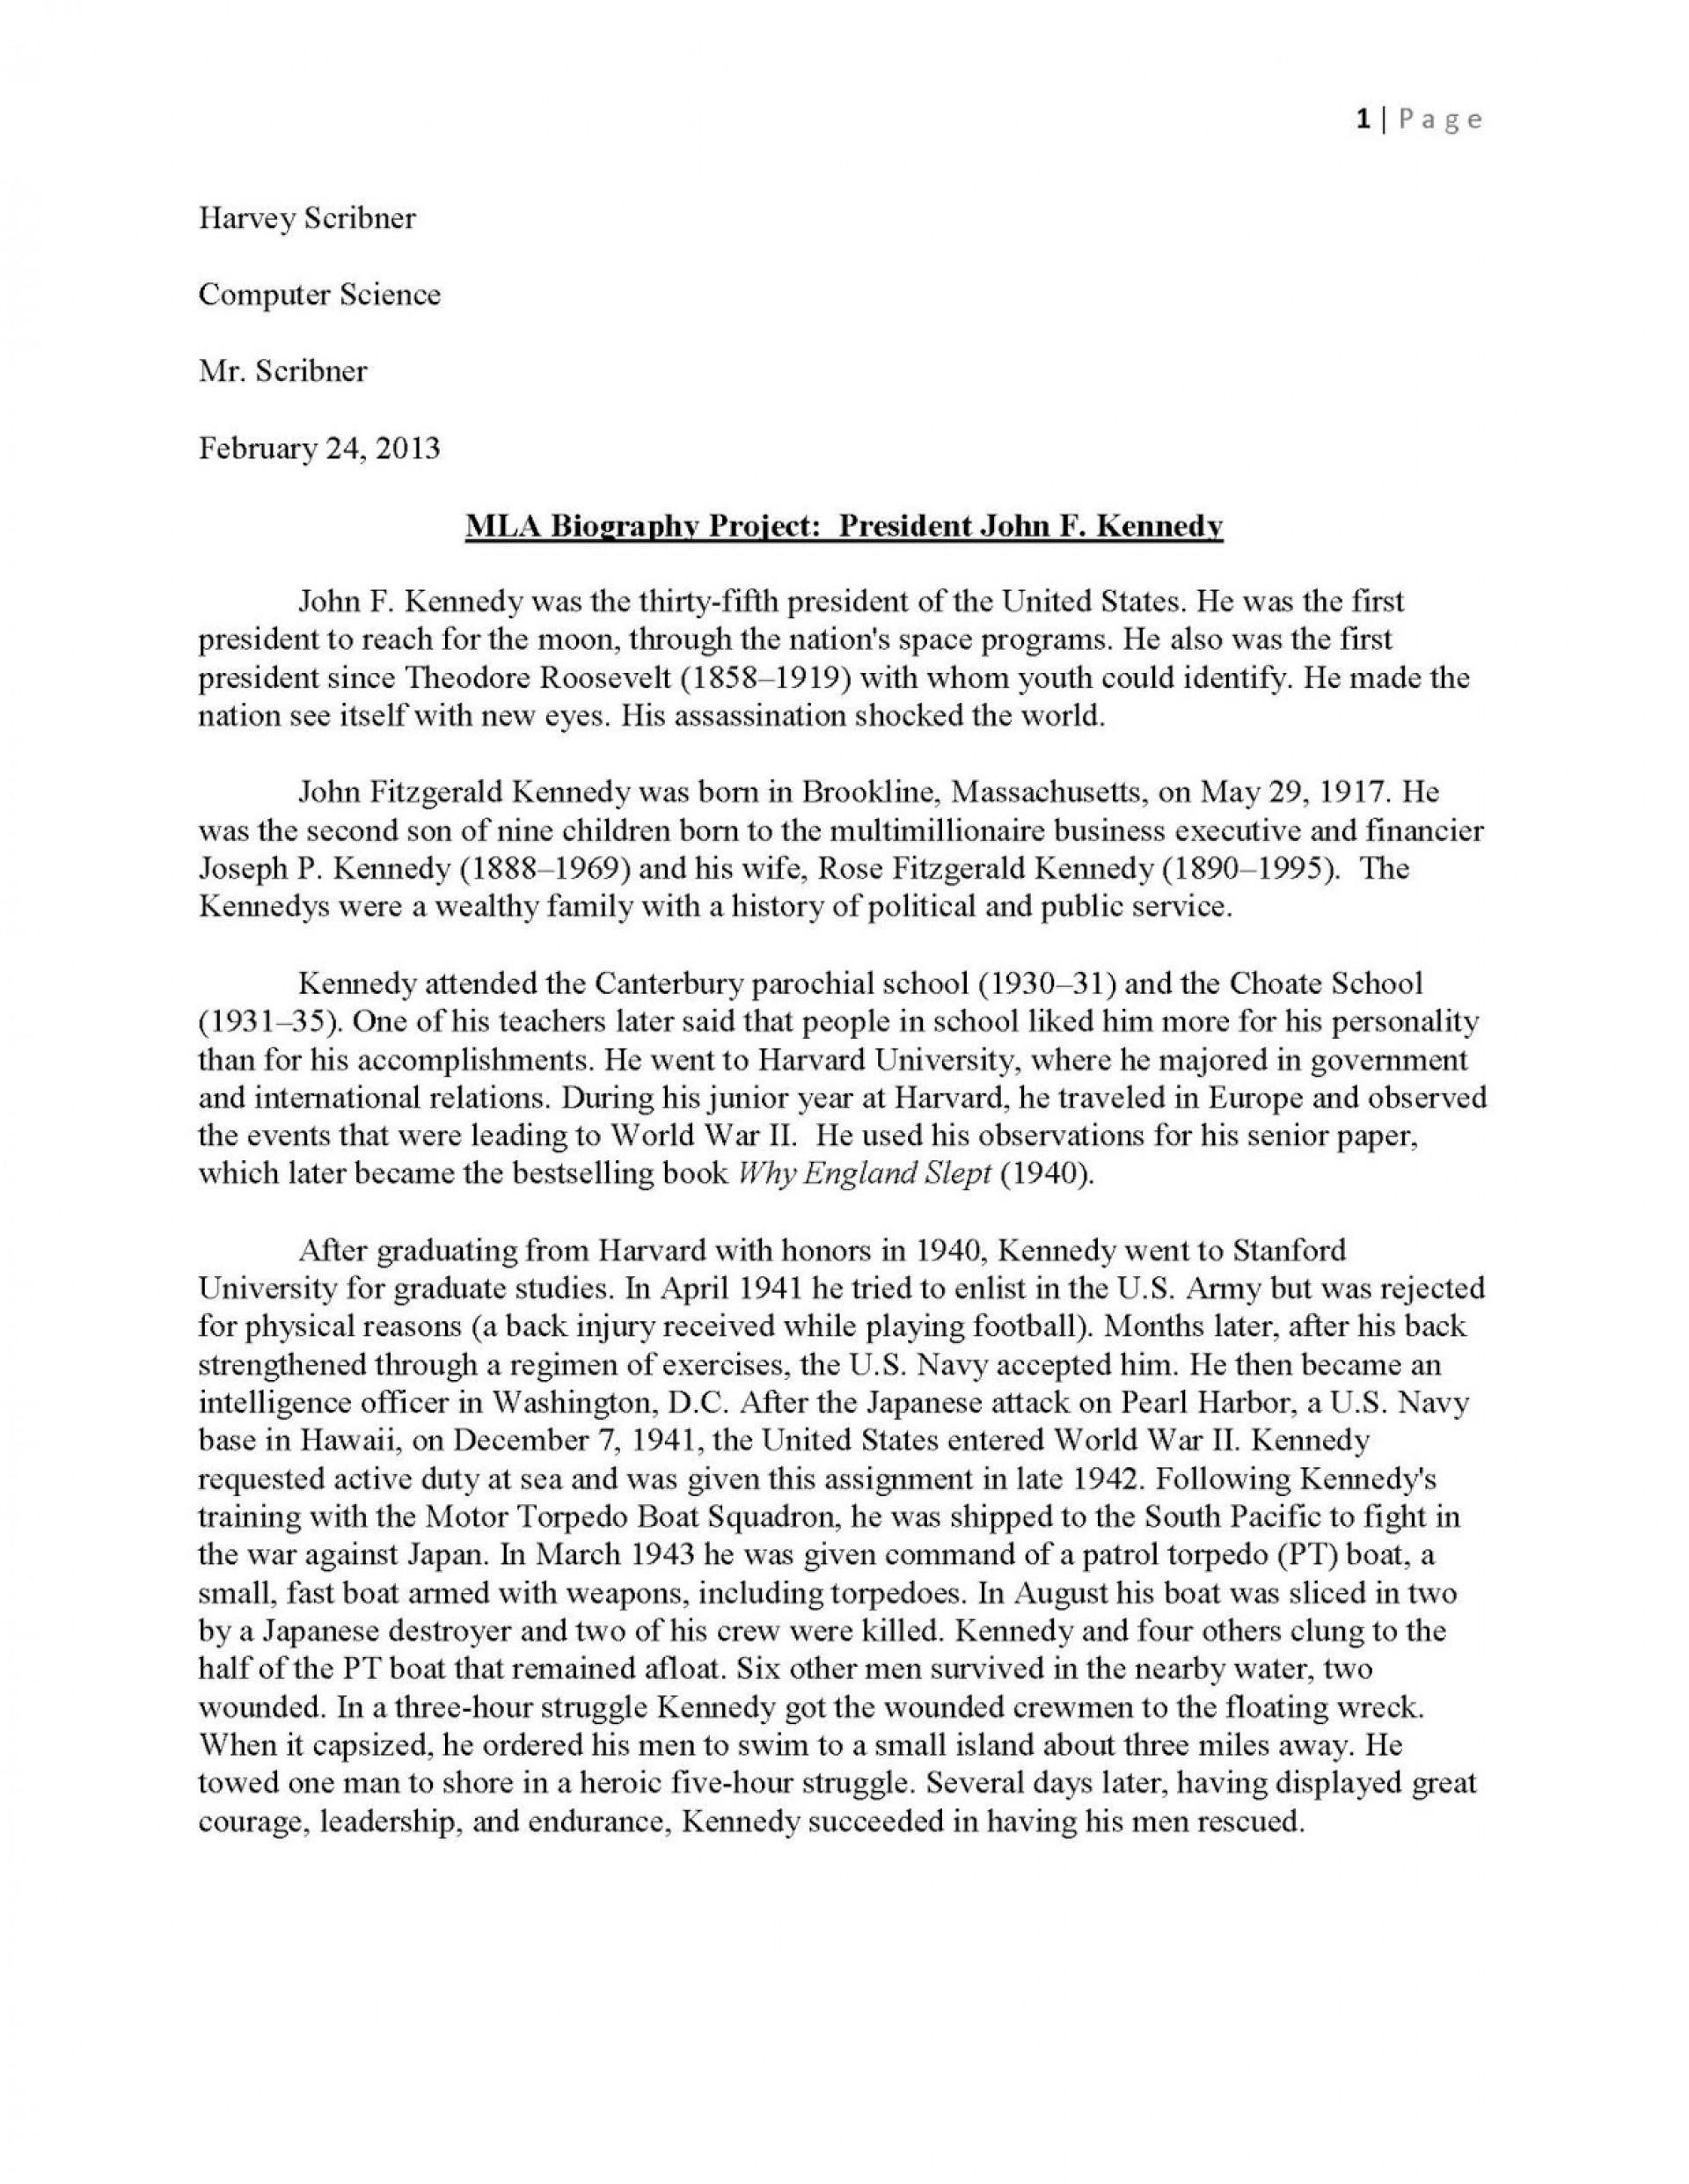 012 Jfkmlashortformbiographyreportexample Page 1 Essay Example Unique Autobiography For Highschool Students Pdf Bibliography Examples 1920